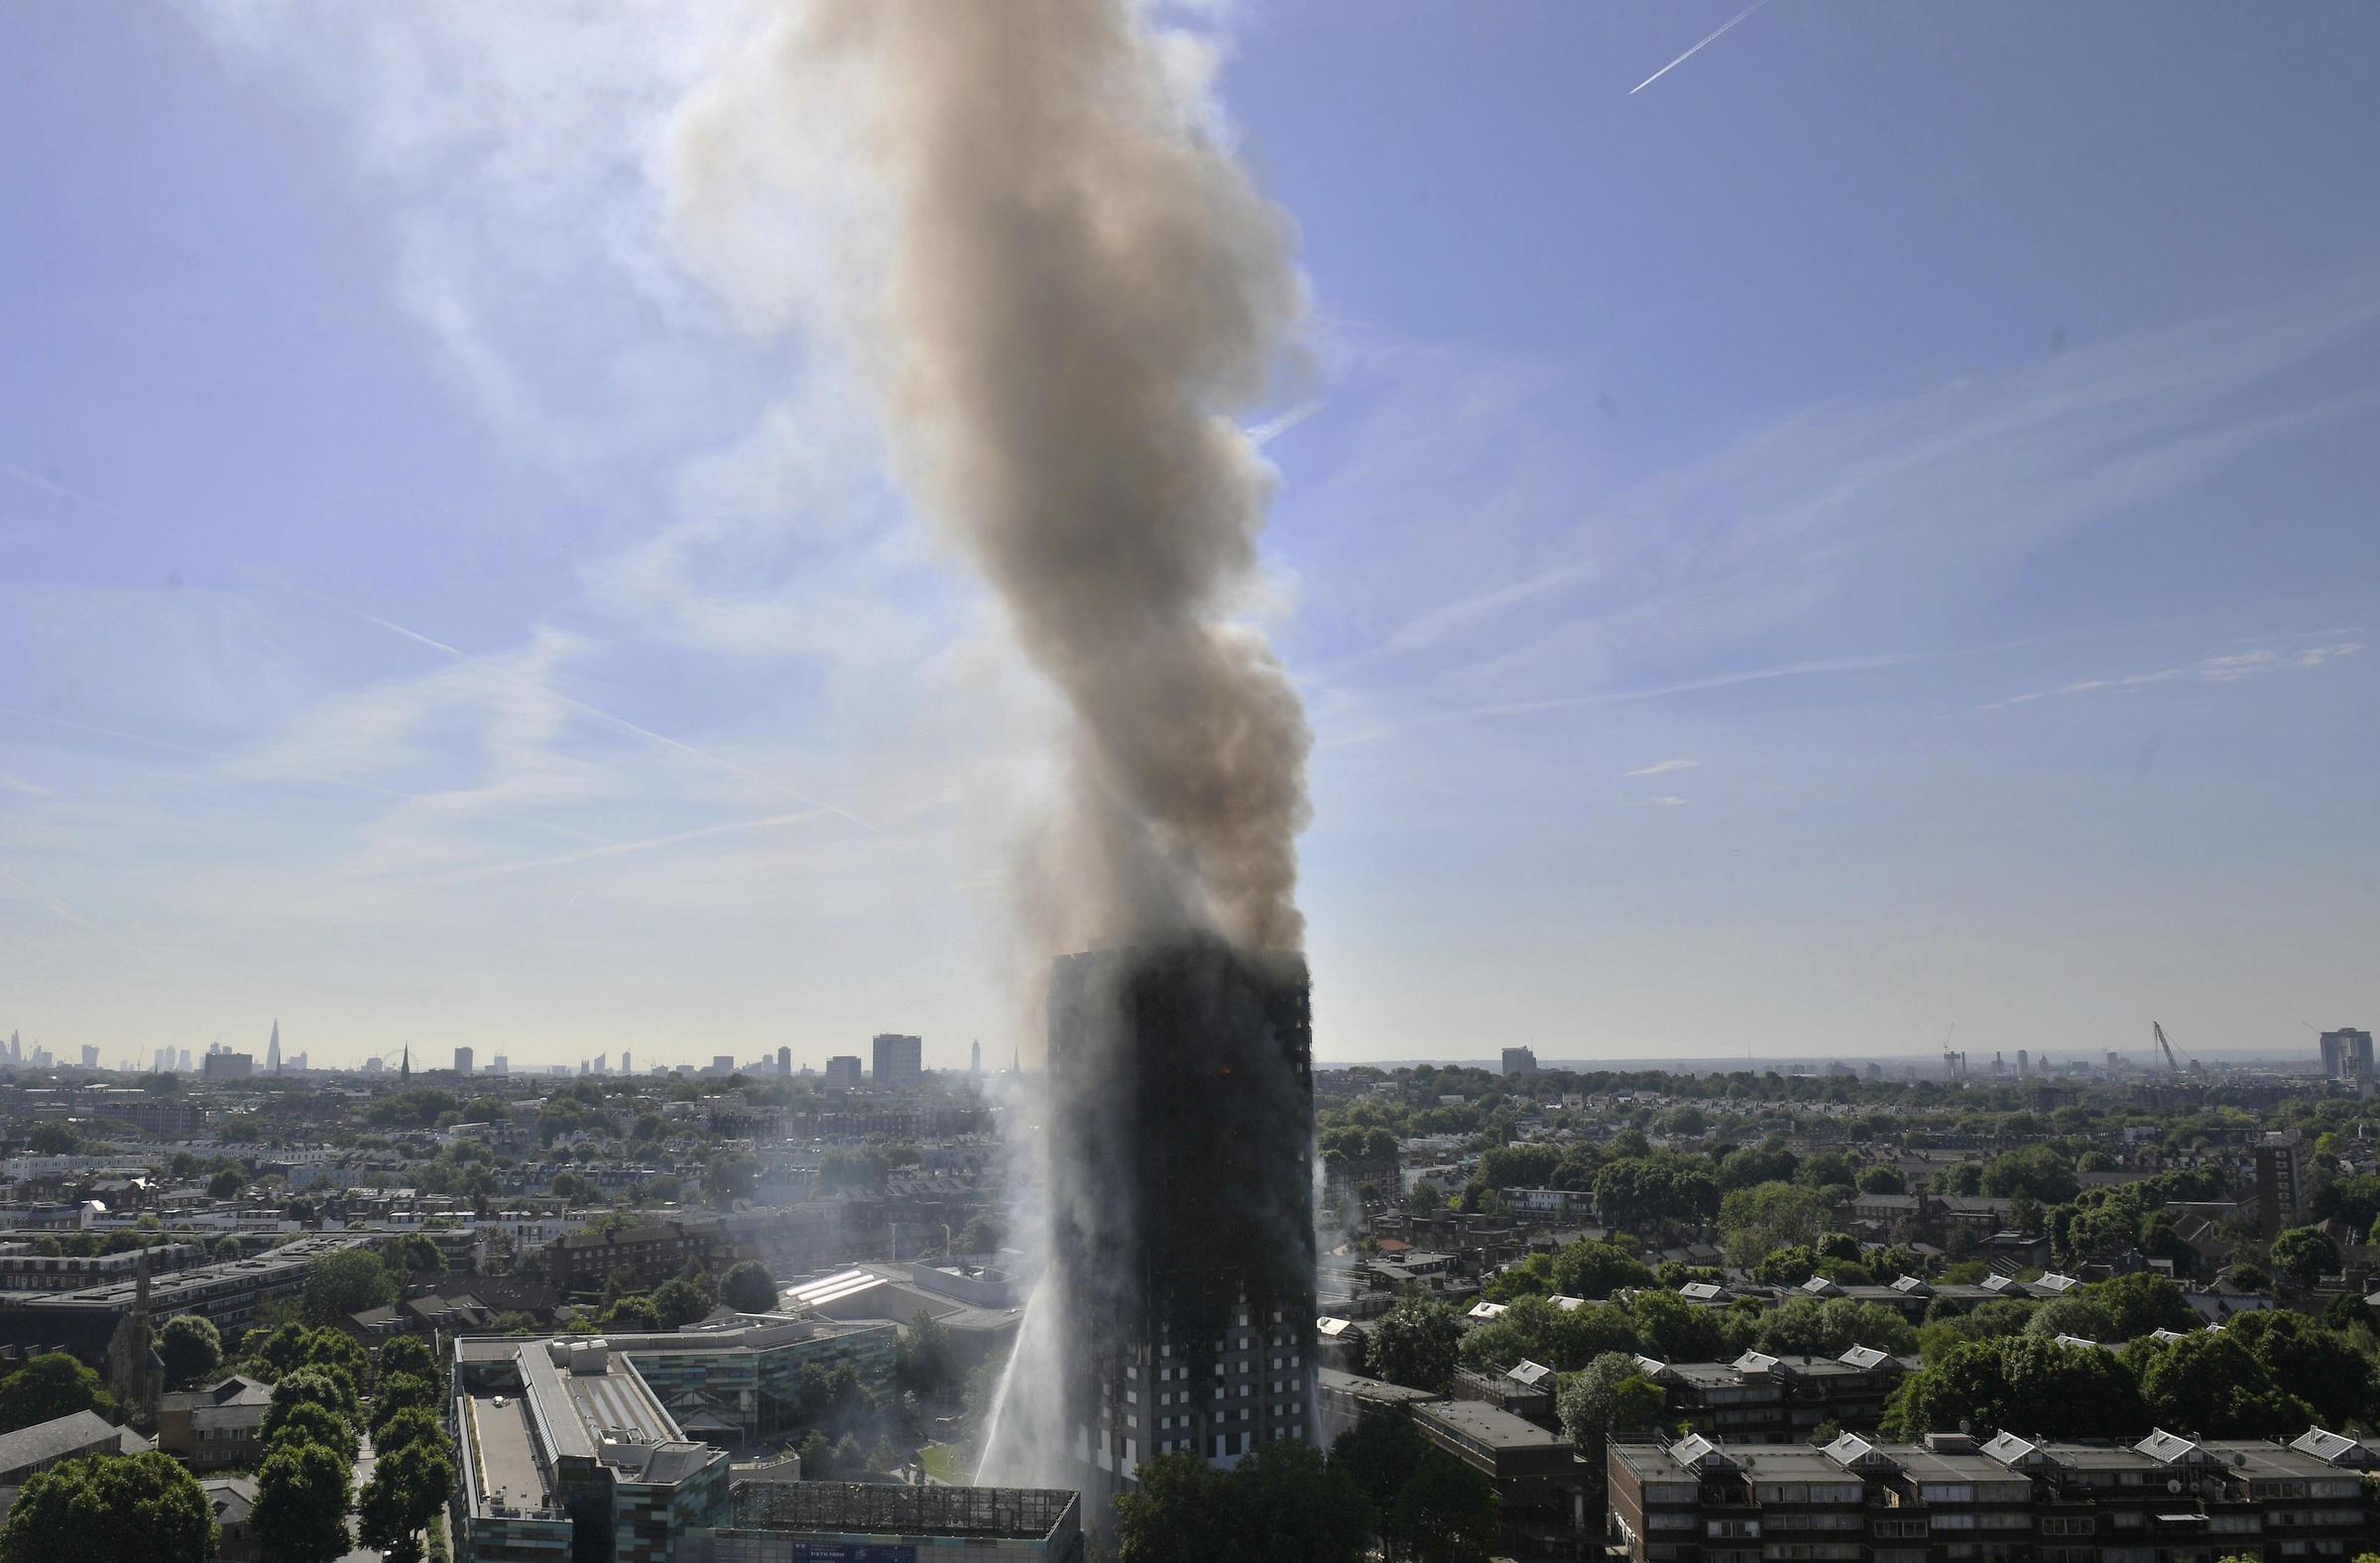 London Firefighters Battling Massive High-Rise Blaze